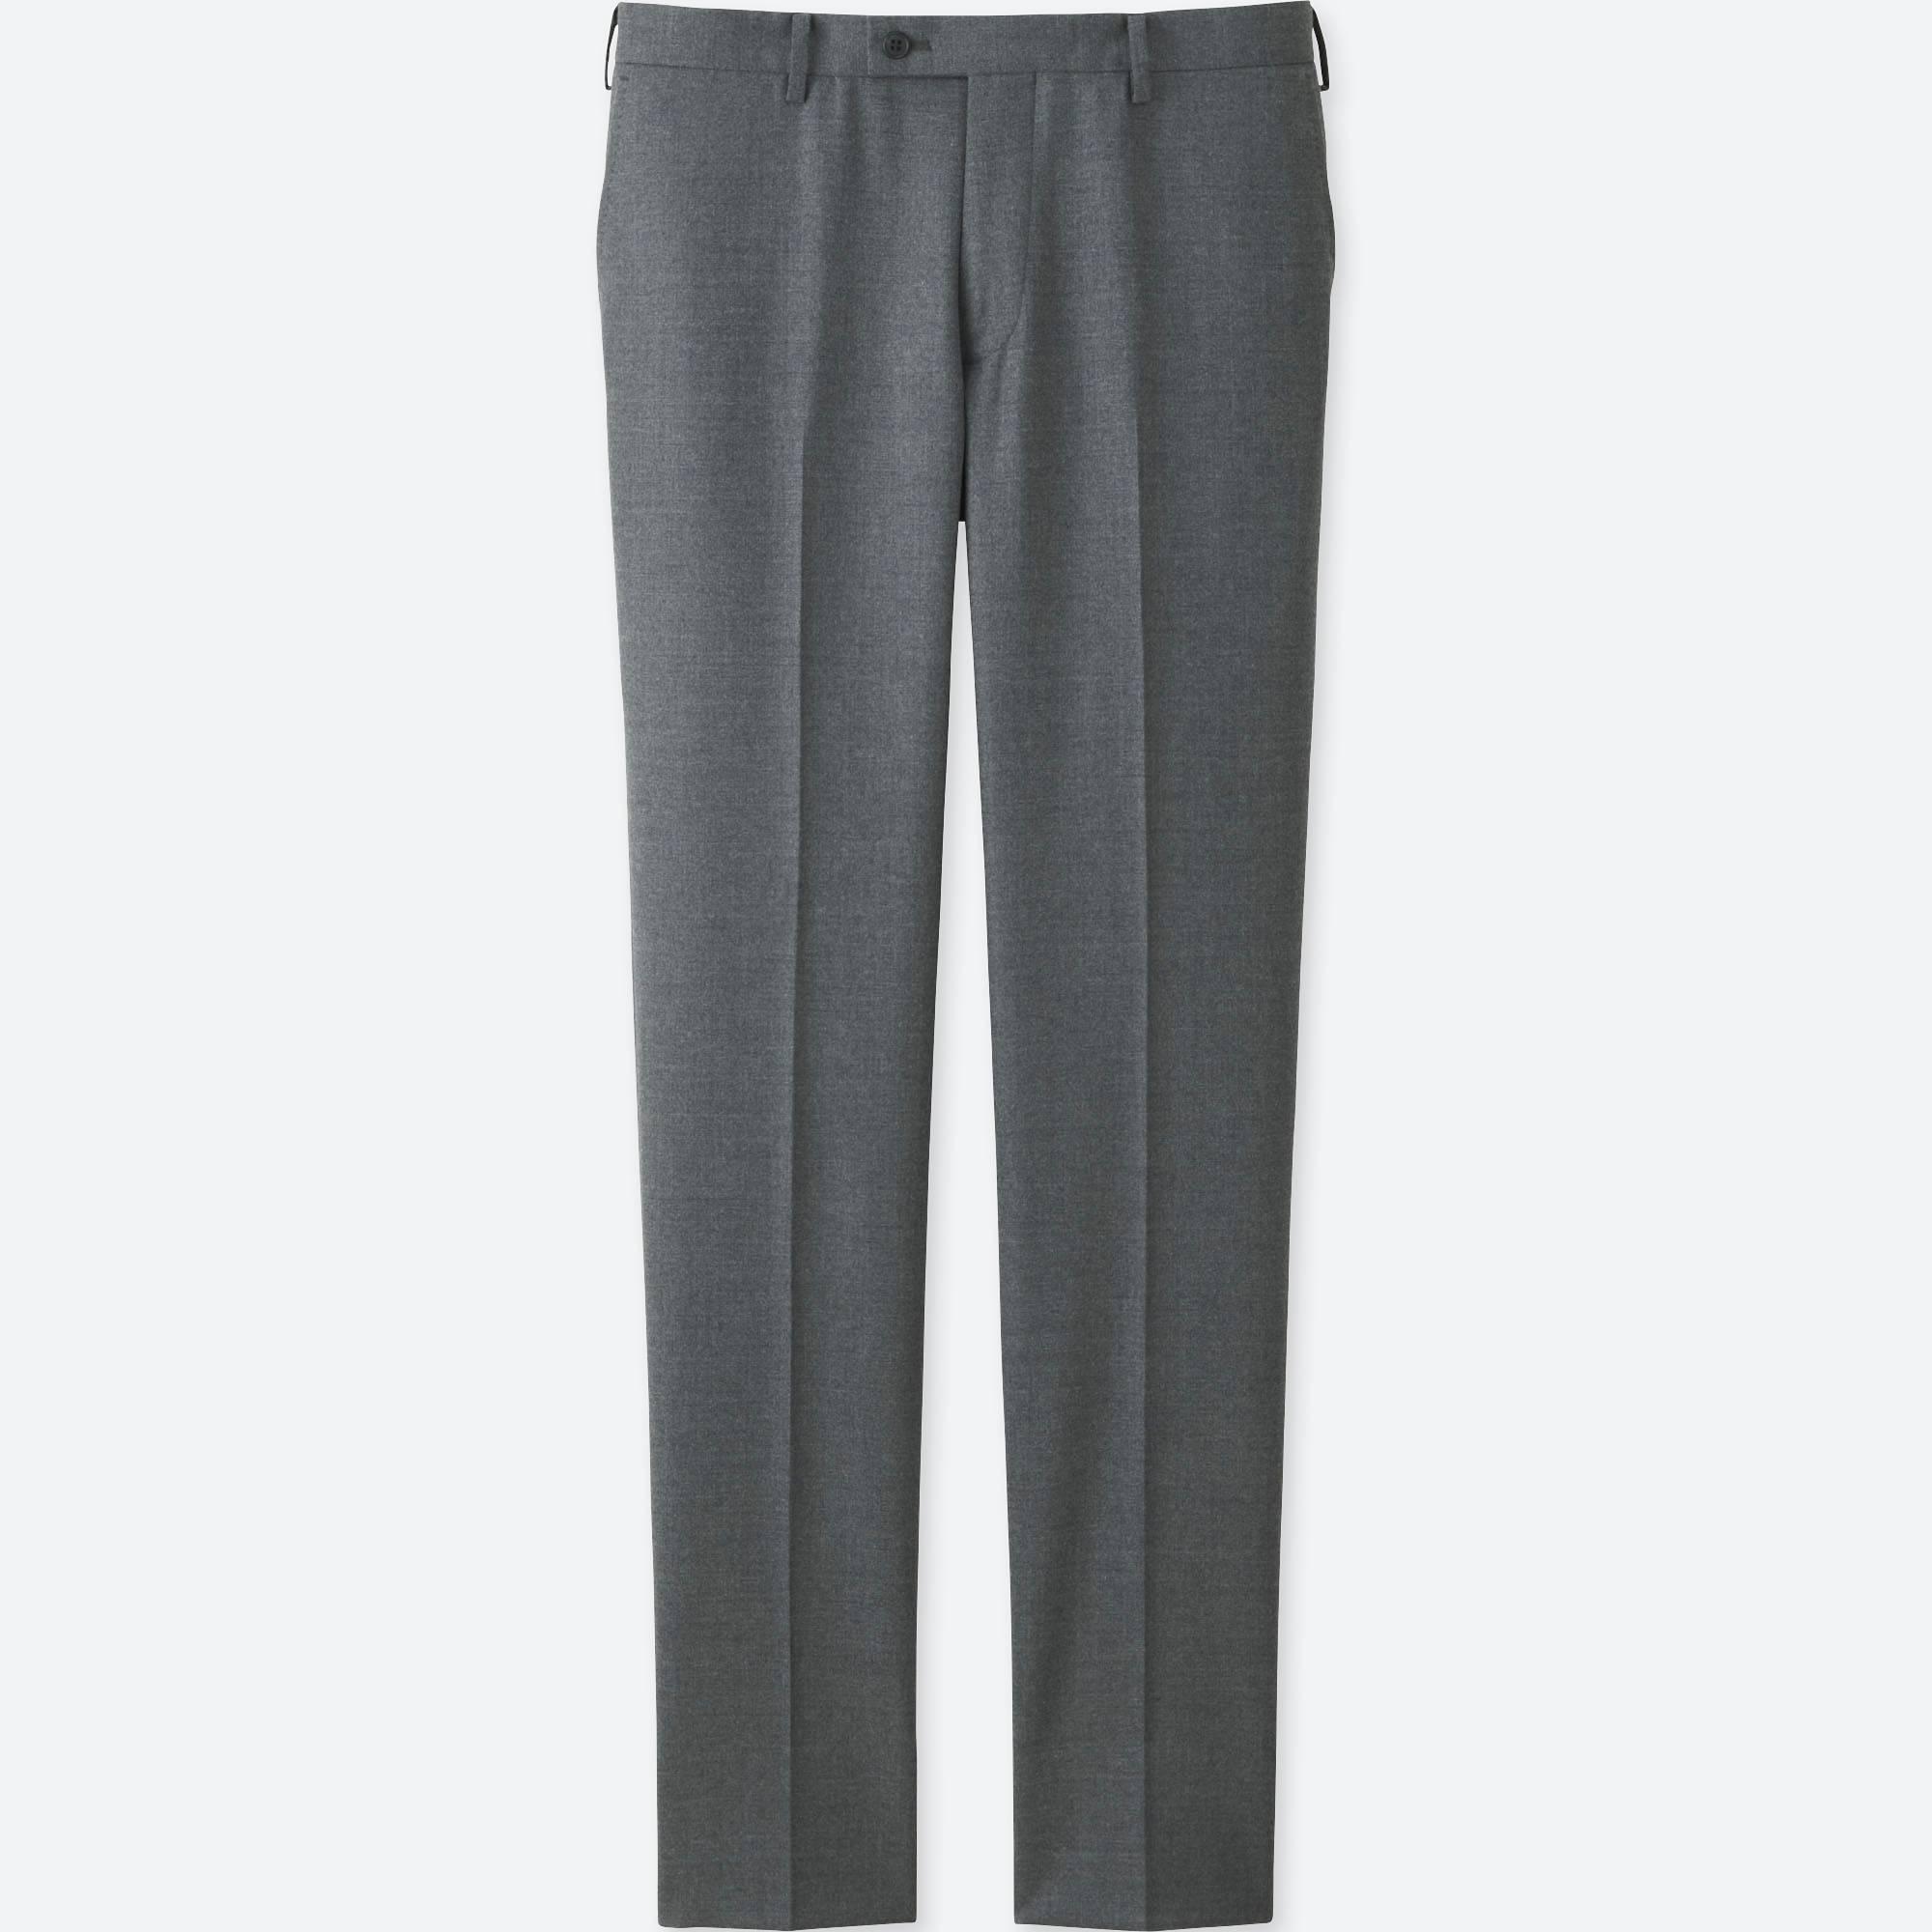 Men Stretch Wool Slim Fit Flat Front Pants